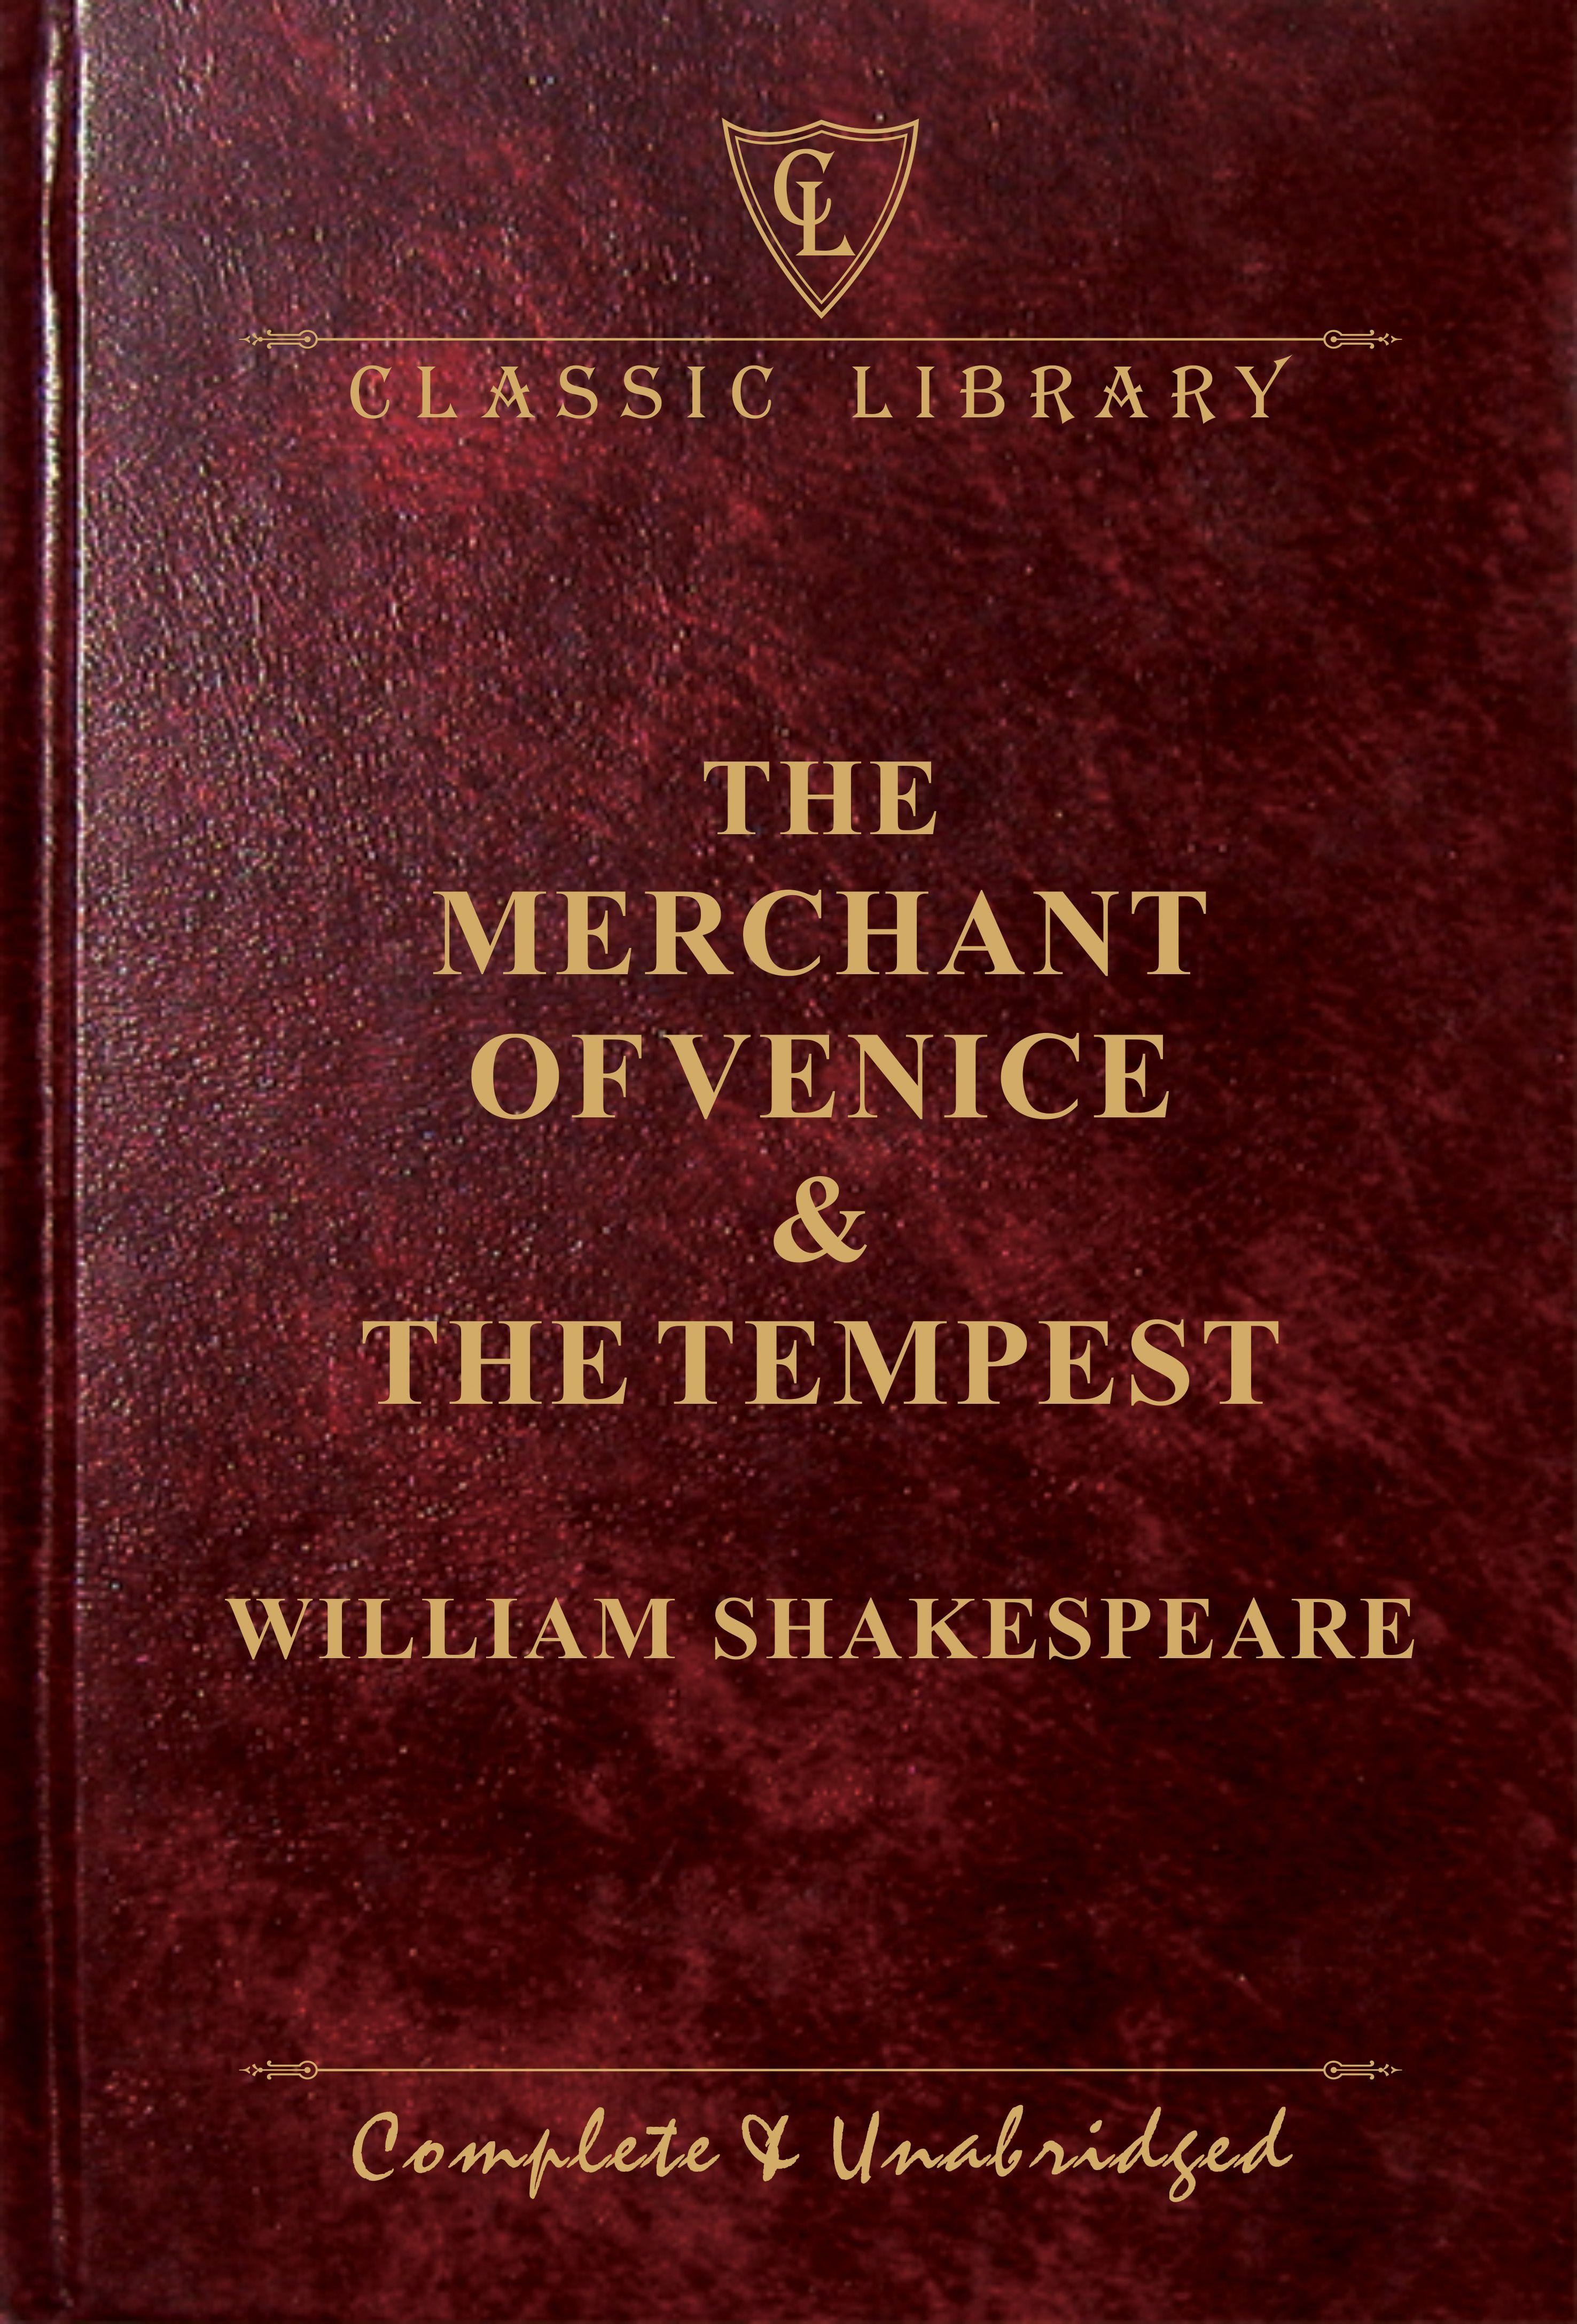 CL:The Merchant of Venice & The Tempest